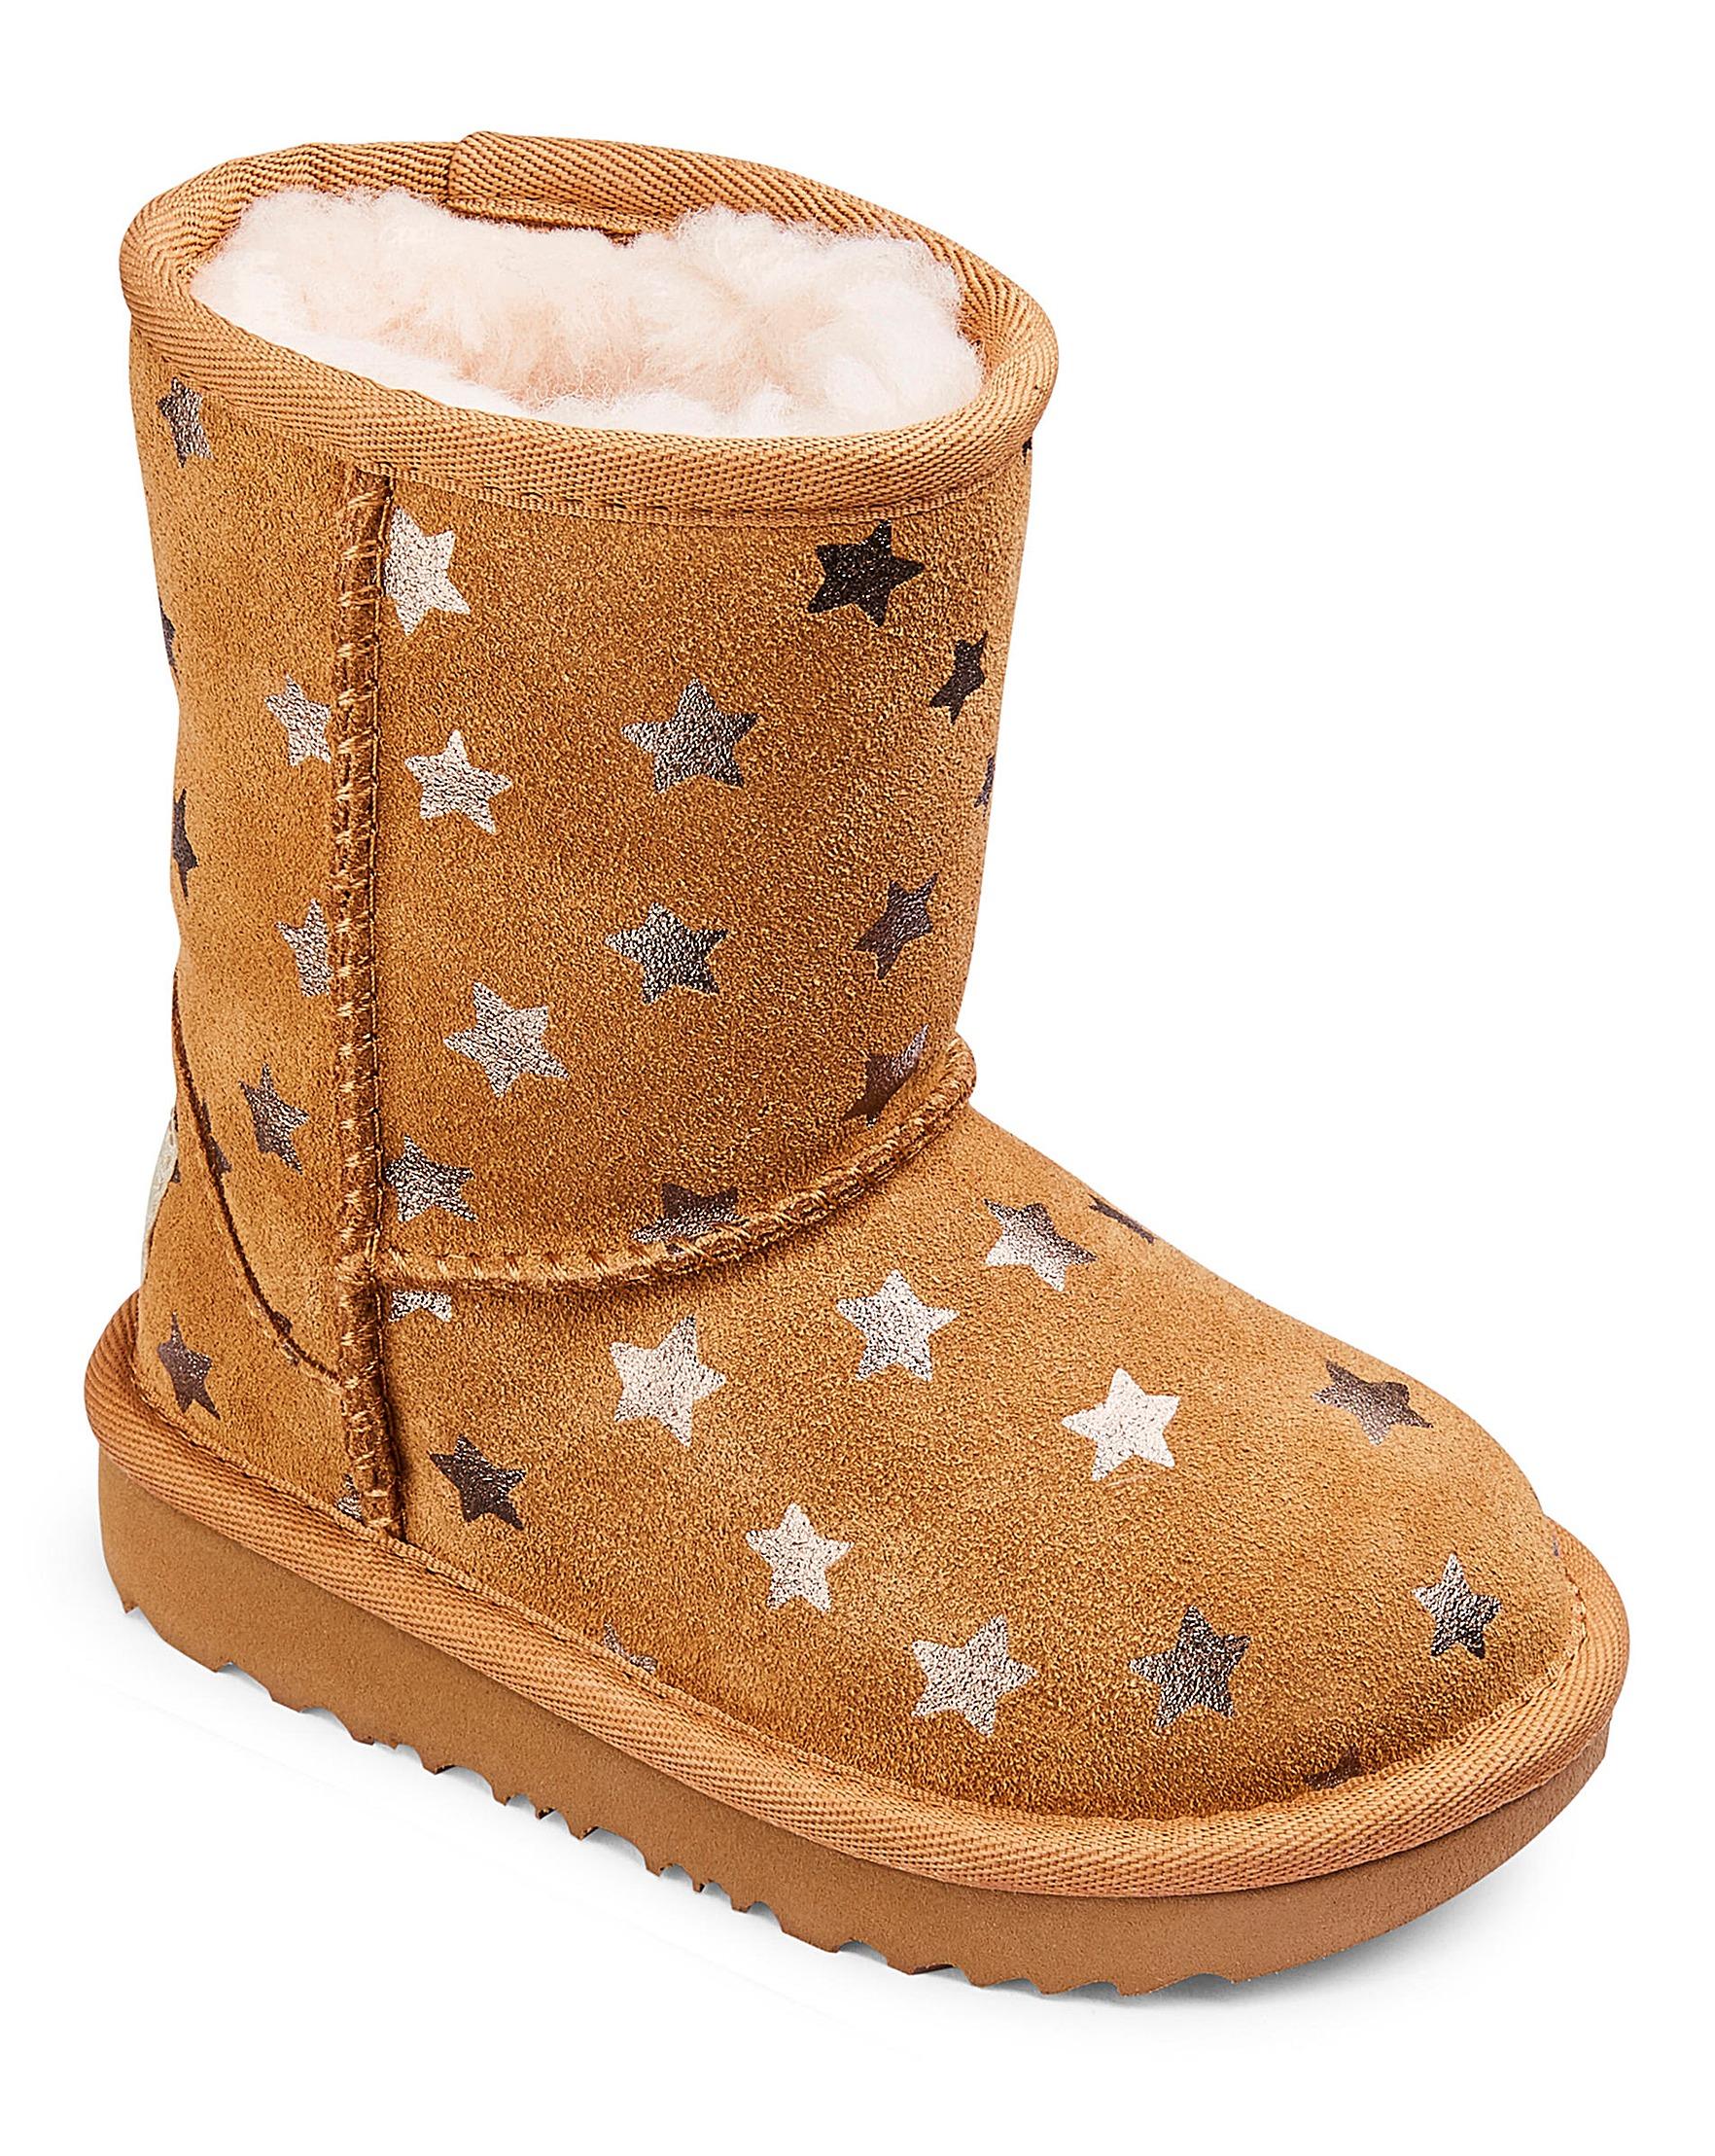 d0dd3f071a4 Ugg Classic Short II Stars Boot